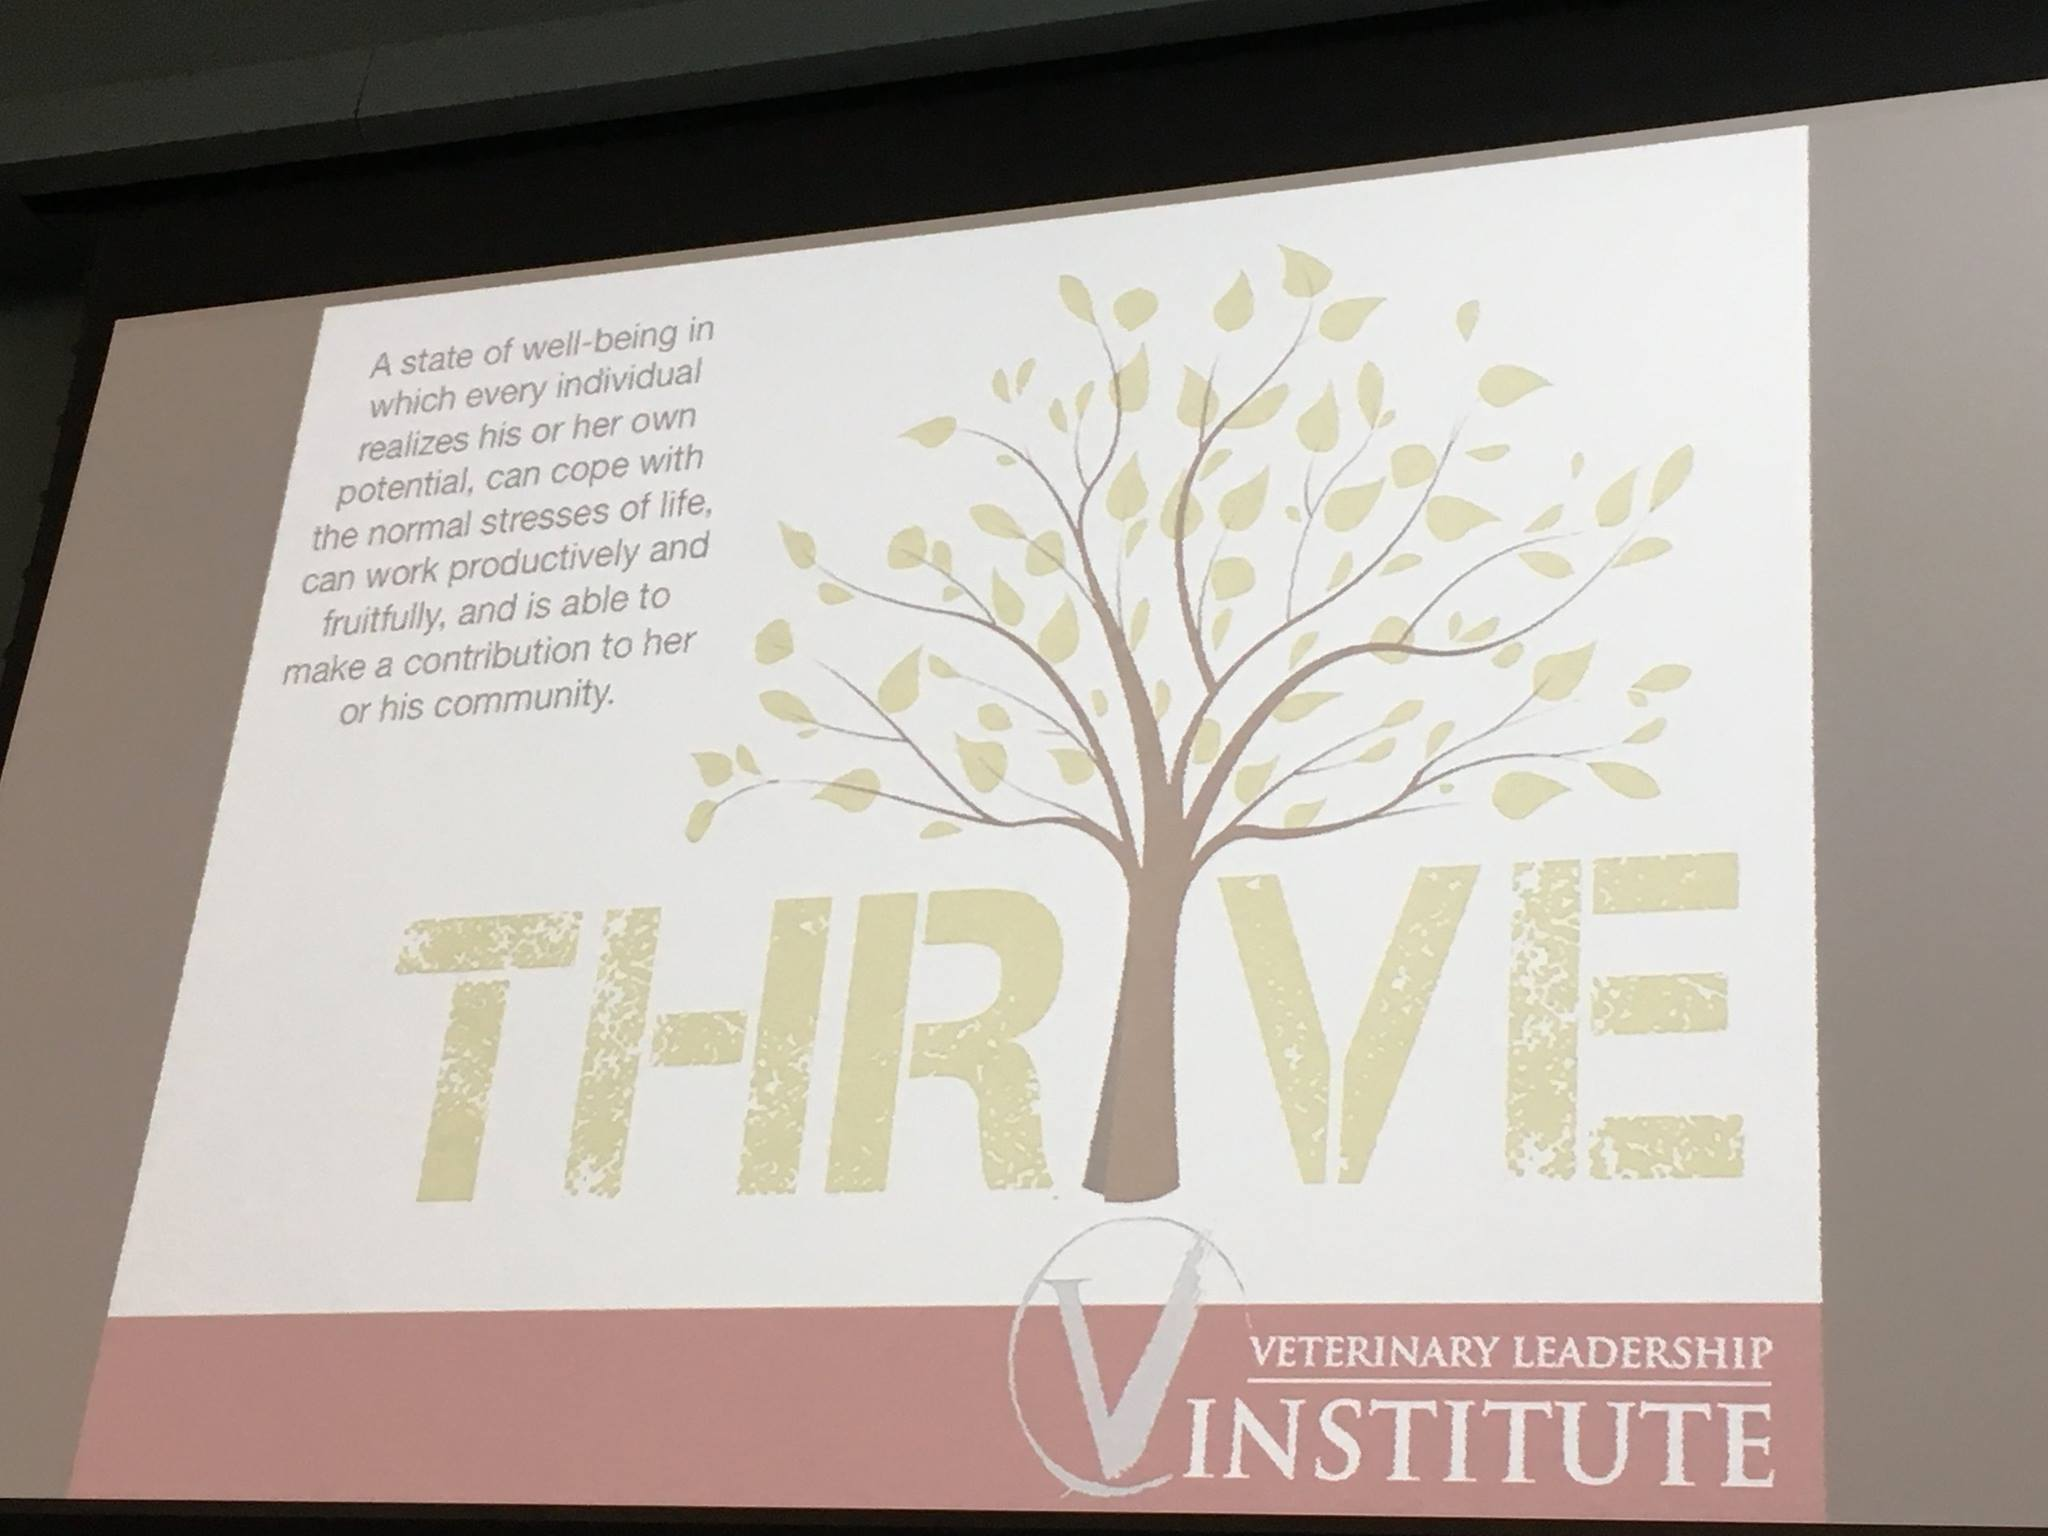 1.3-cummings-thrive-image-4